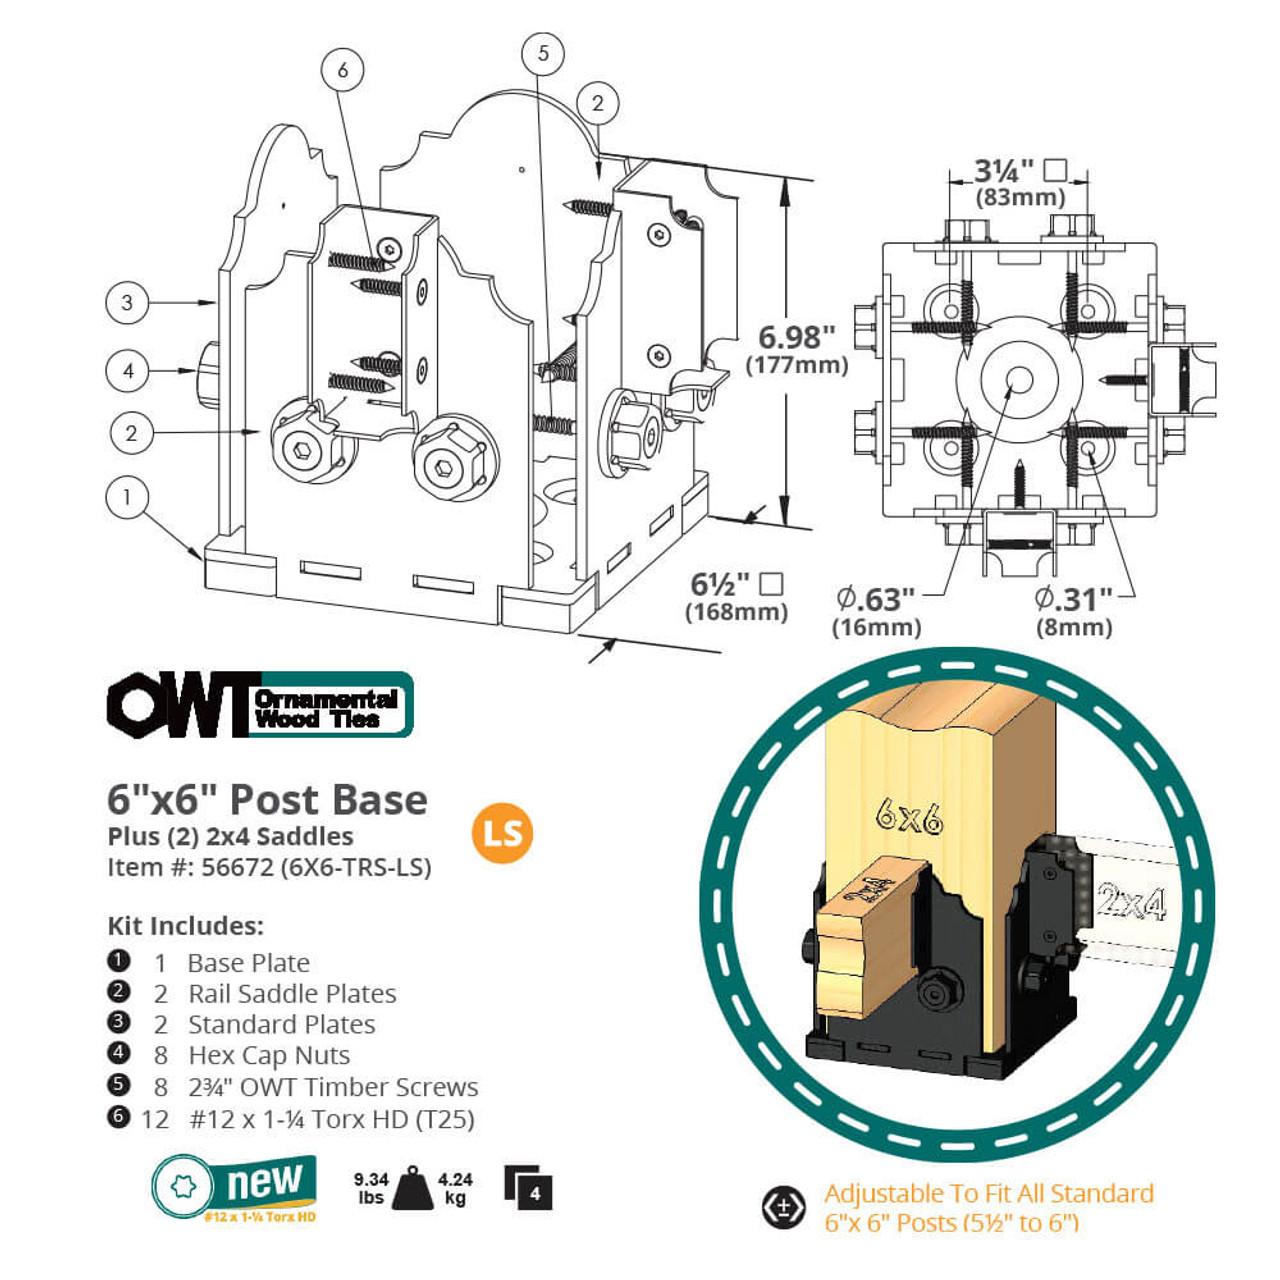 OZCO 6X6TRS-LS Post Base Twin Rail Saddle Dimension Drawing